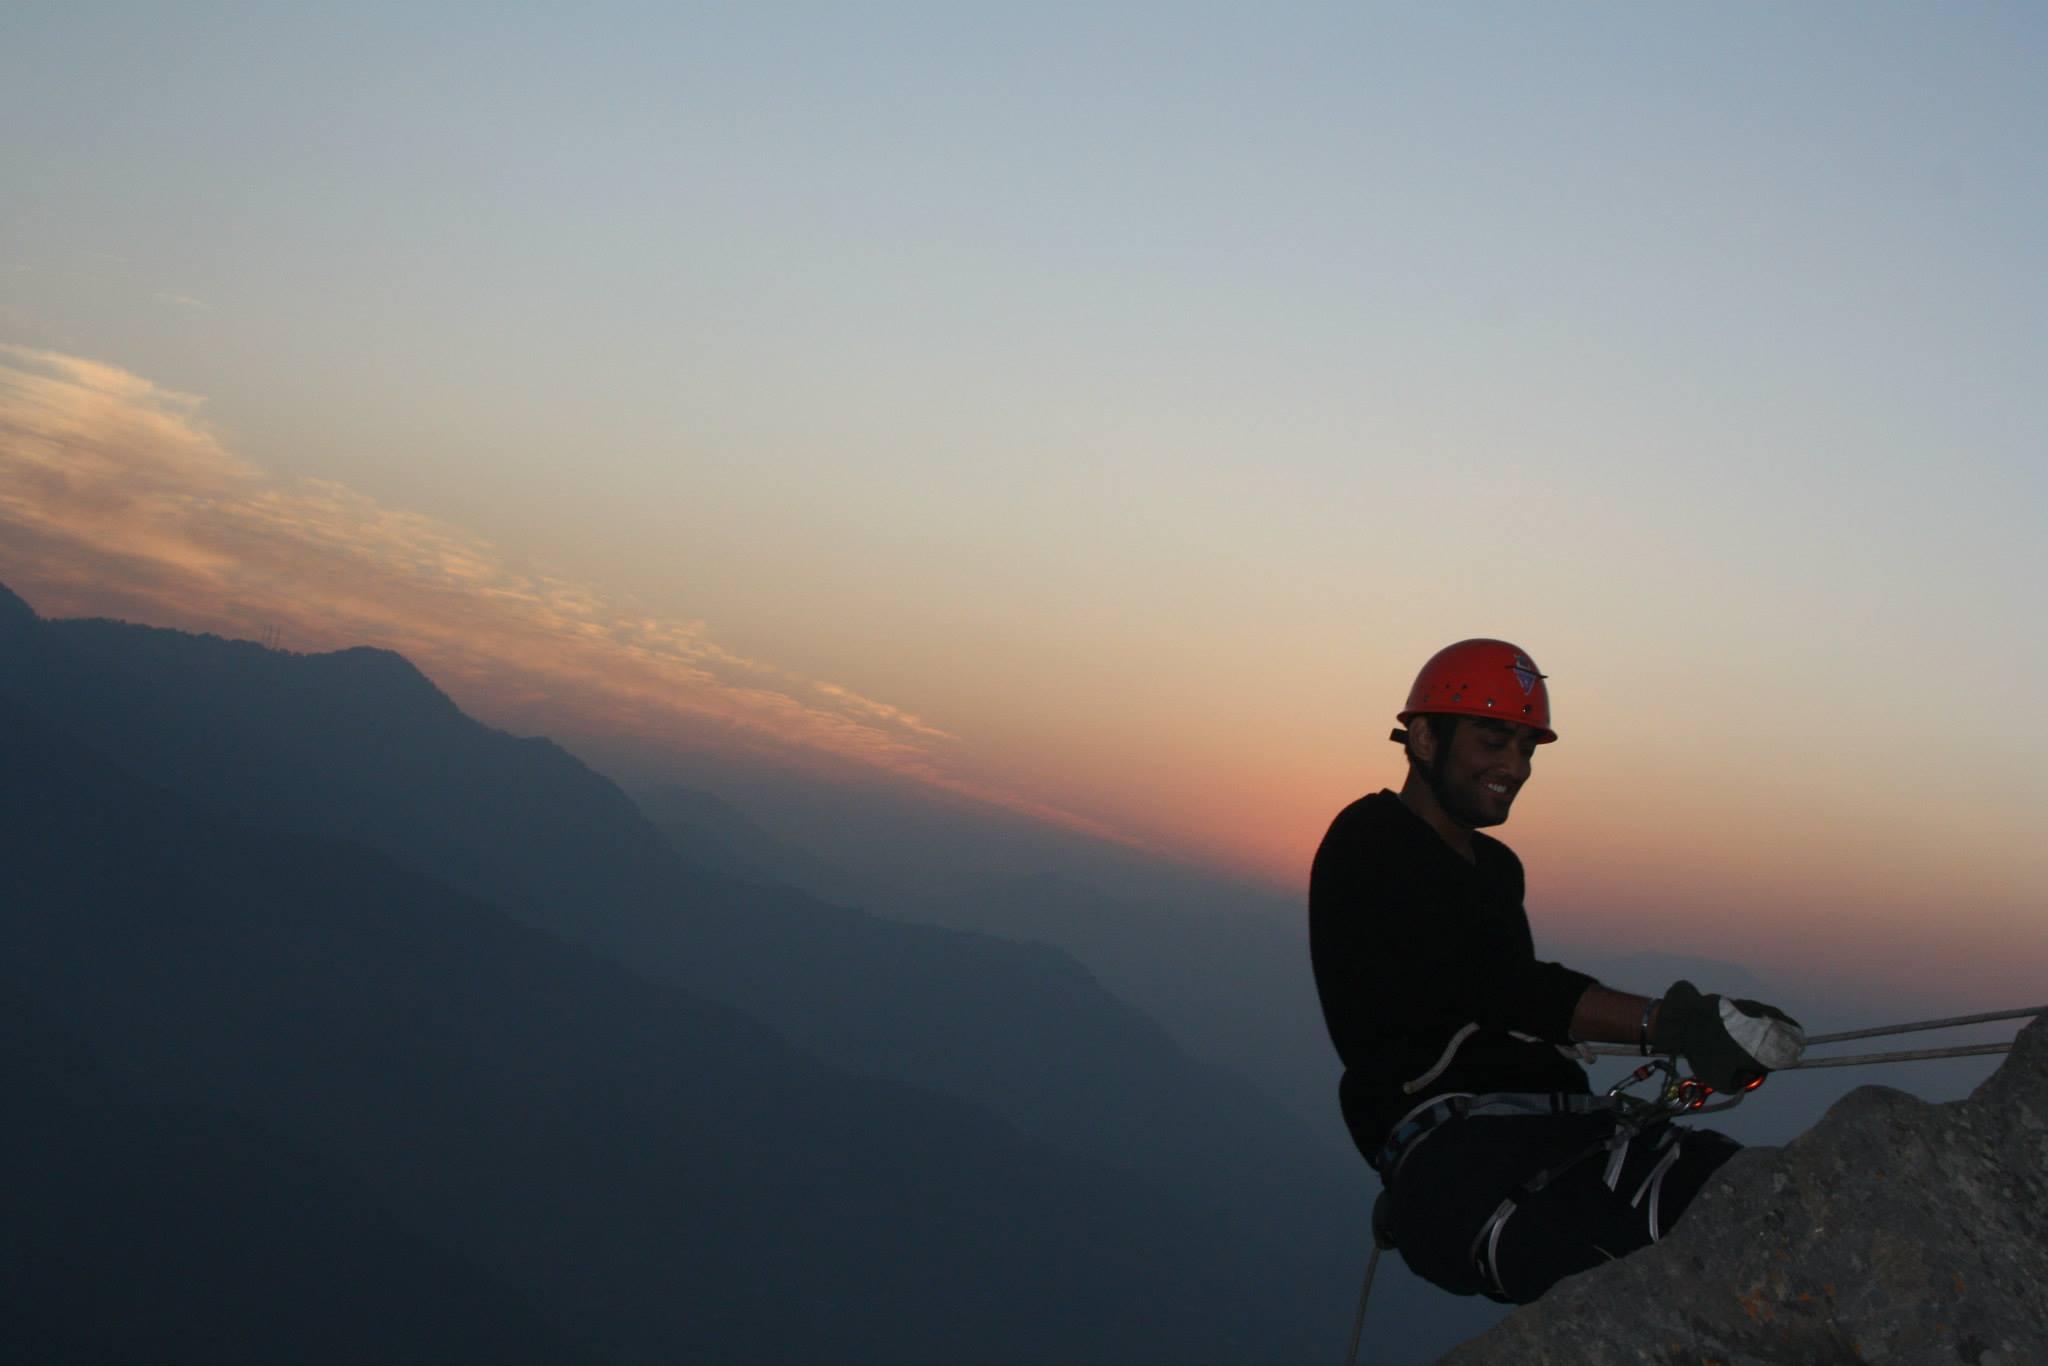 Varun Sethi while Mountaineering